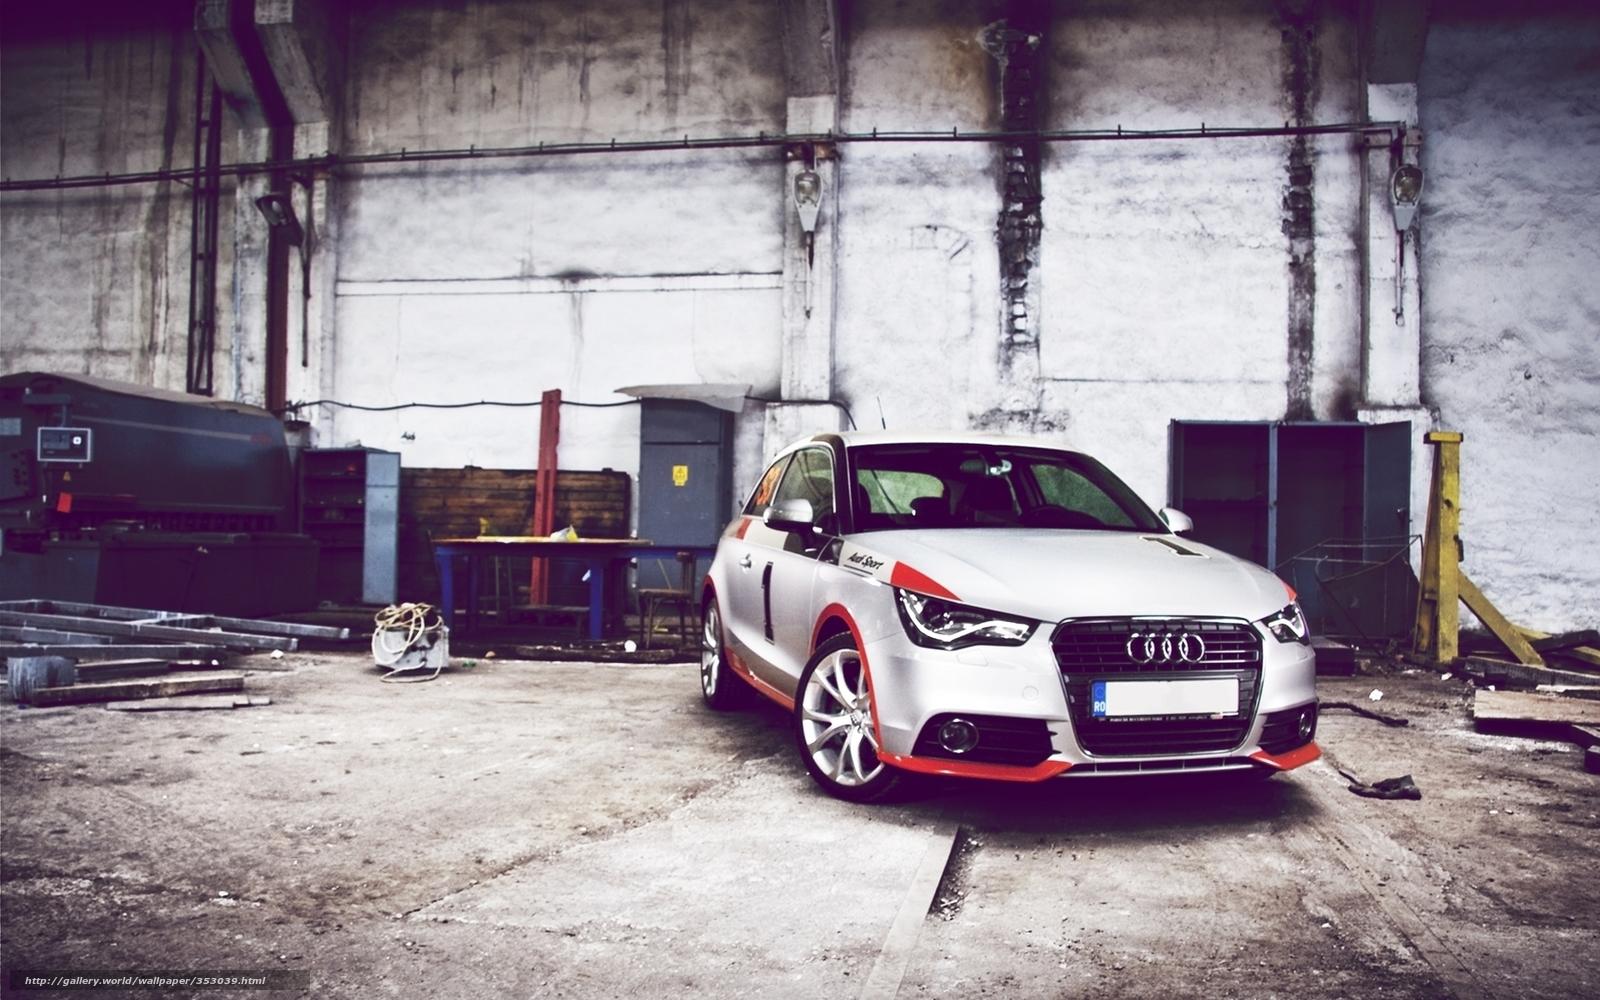 Download Wallpaper Garage, Car Wallpaper, Audi Free Desktop Wallpaper In  The Resolution 1680x1050 U2014 Picture №353039